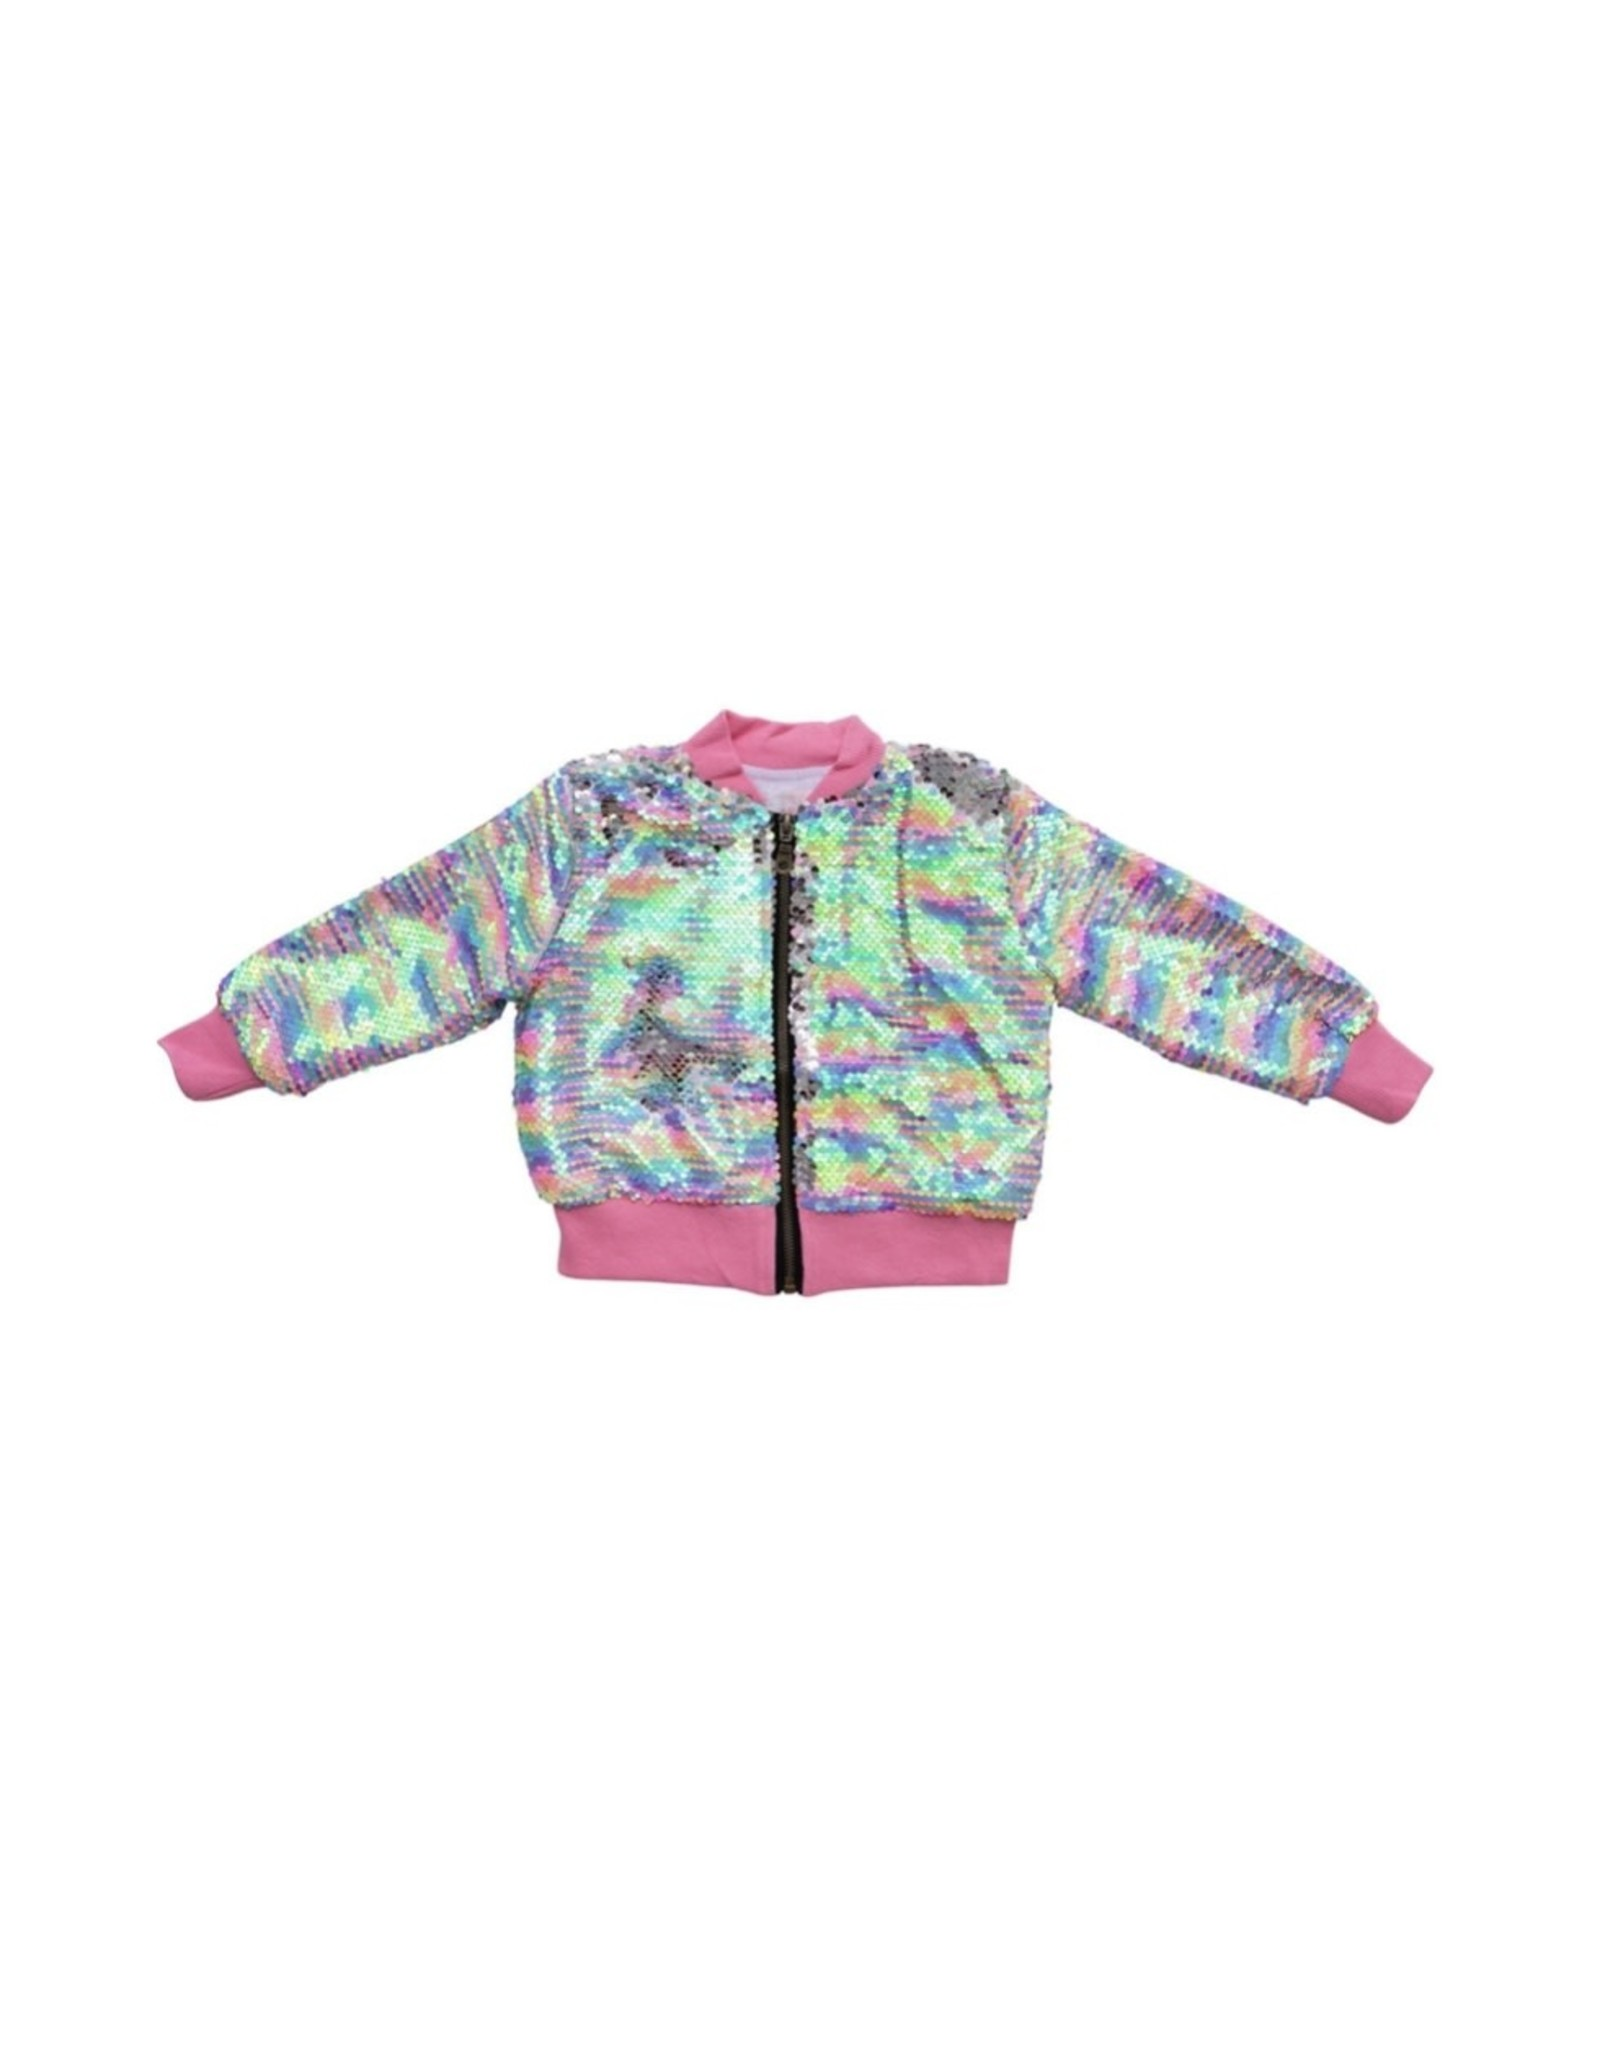 Mila & Rose- Sprinkles Flip Sequin Jacket